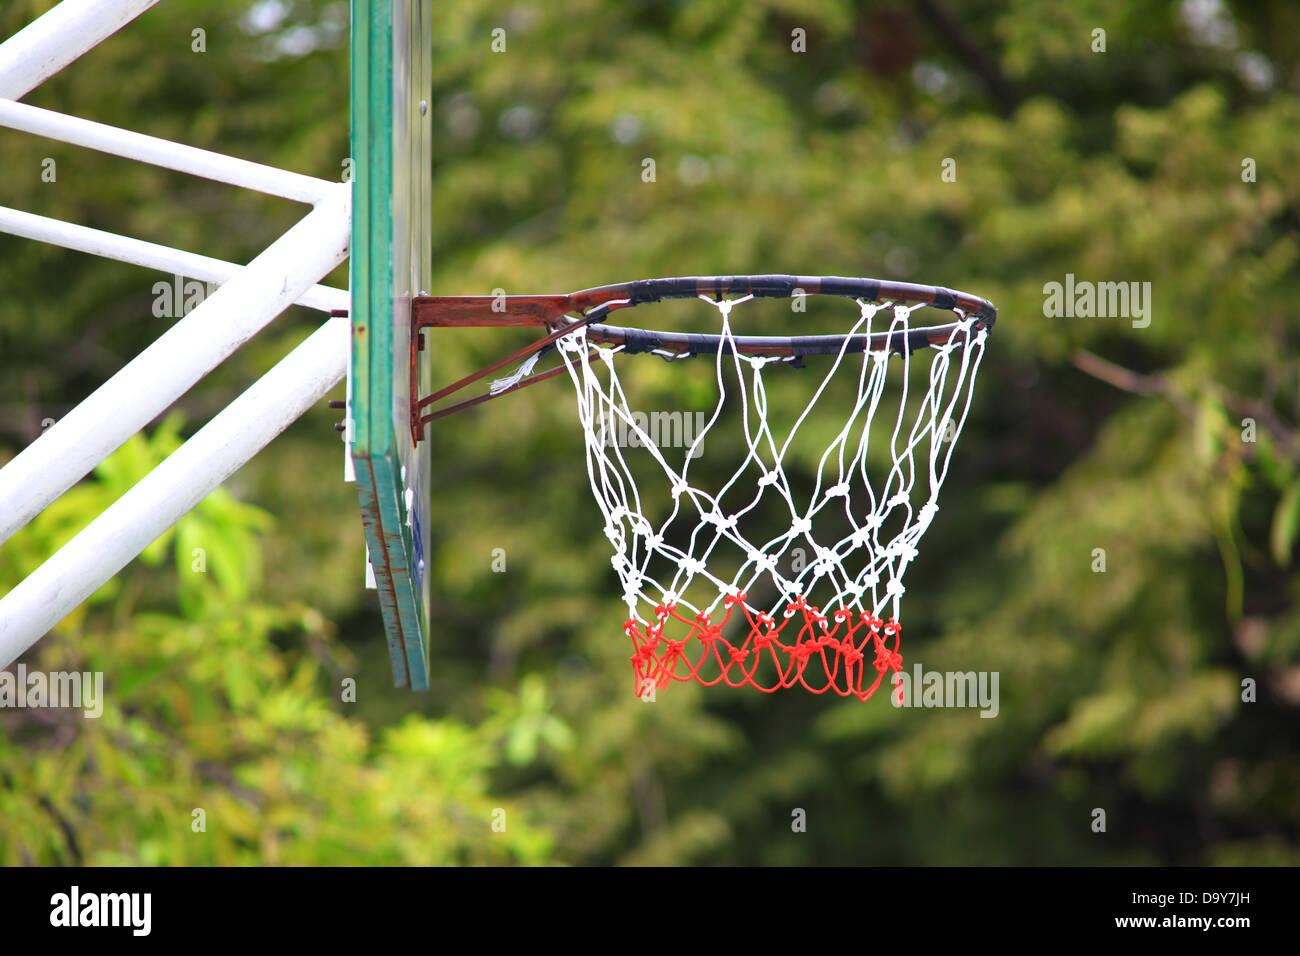 aro de baloncesto Imagen De Stock